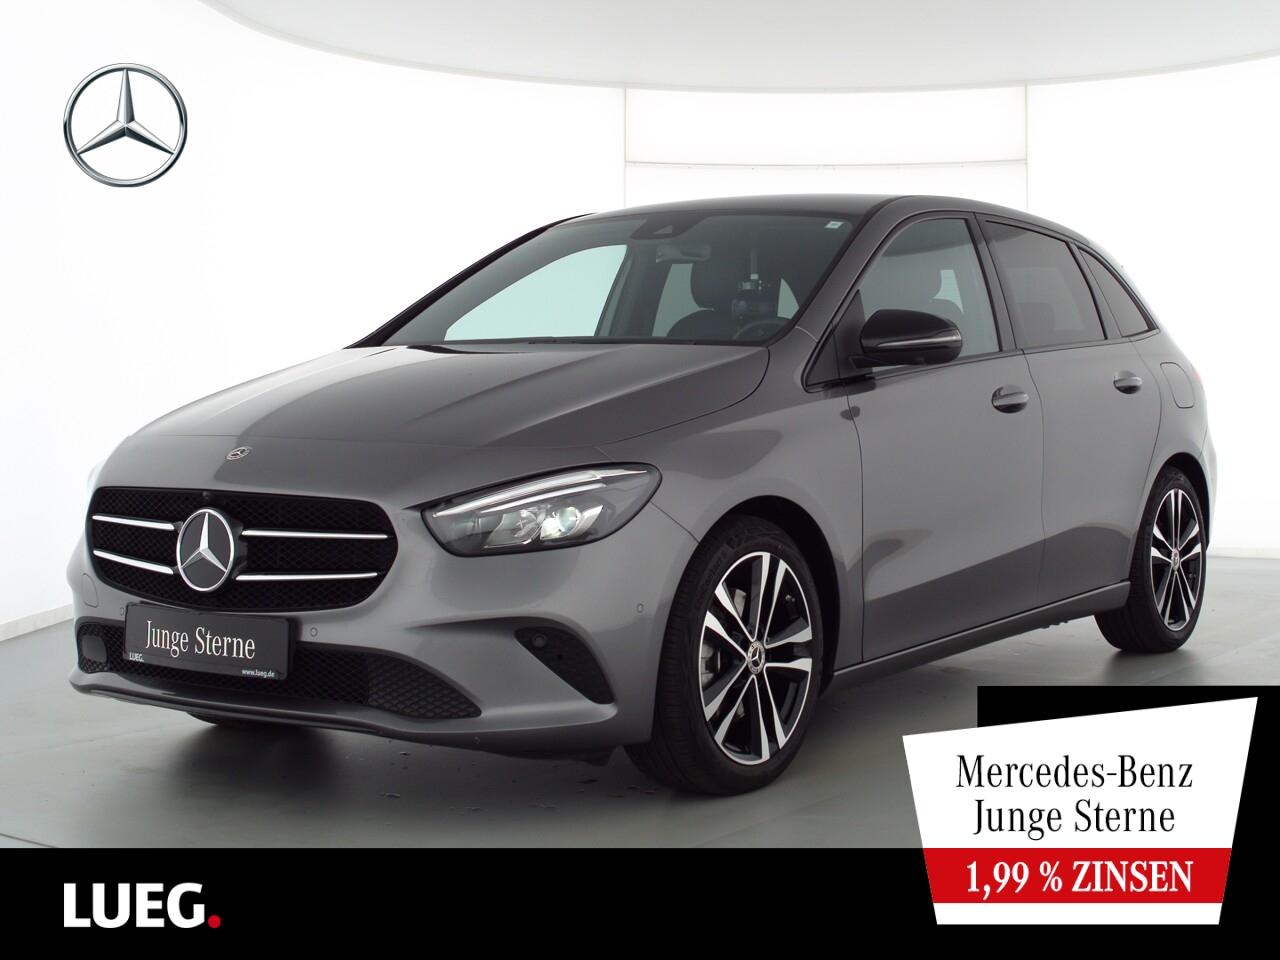 Mercedes-Benz B 220 d 4M Progressive+MBUX+NavPrem+LED+AHK+360°, Jahr 2020, Diesel